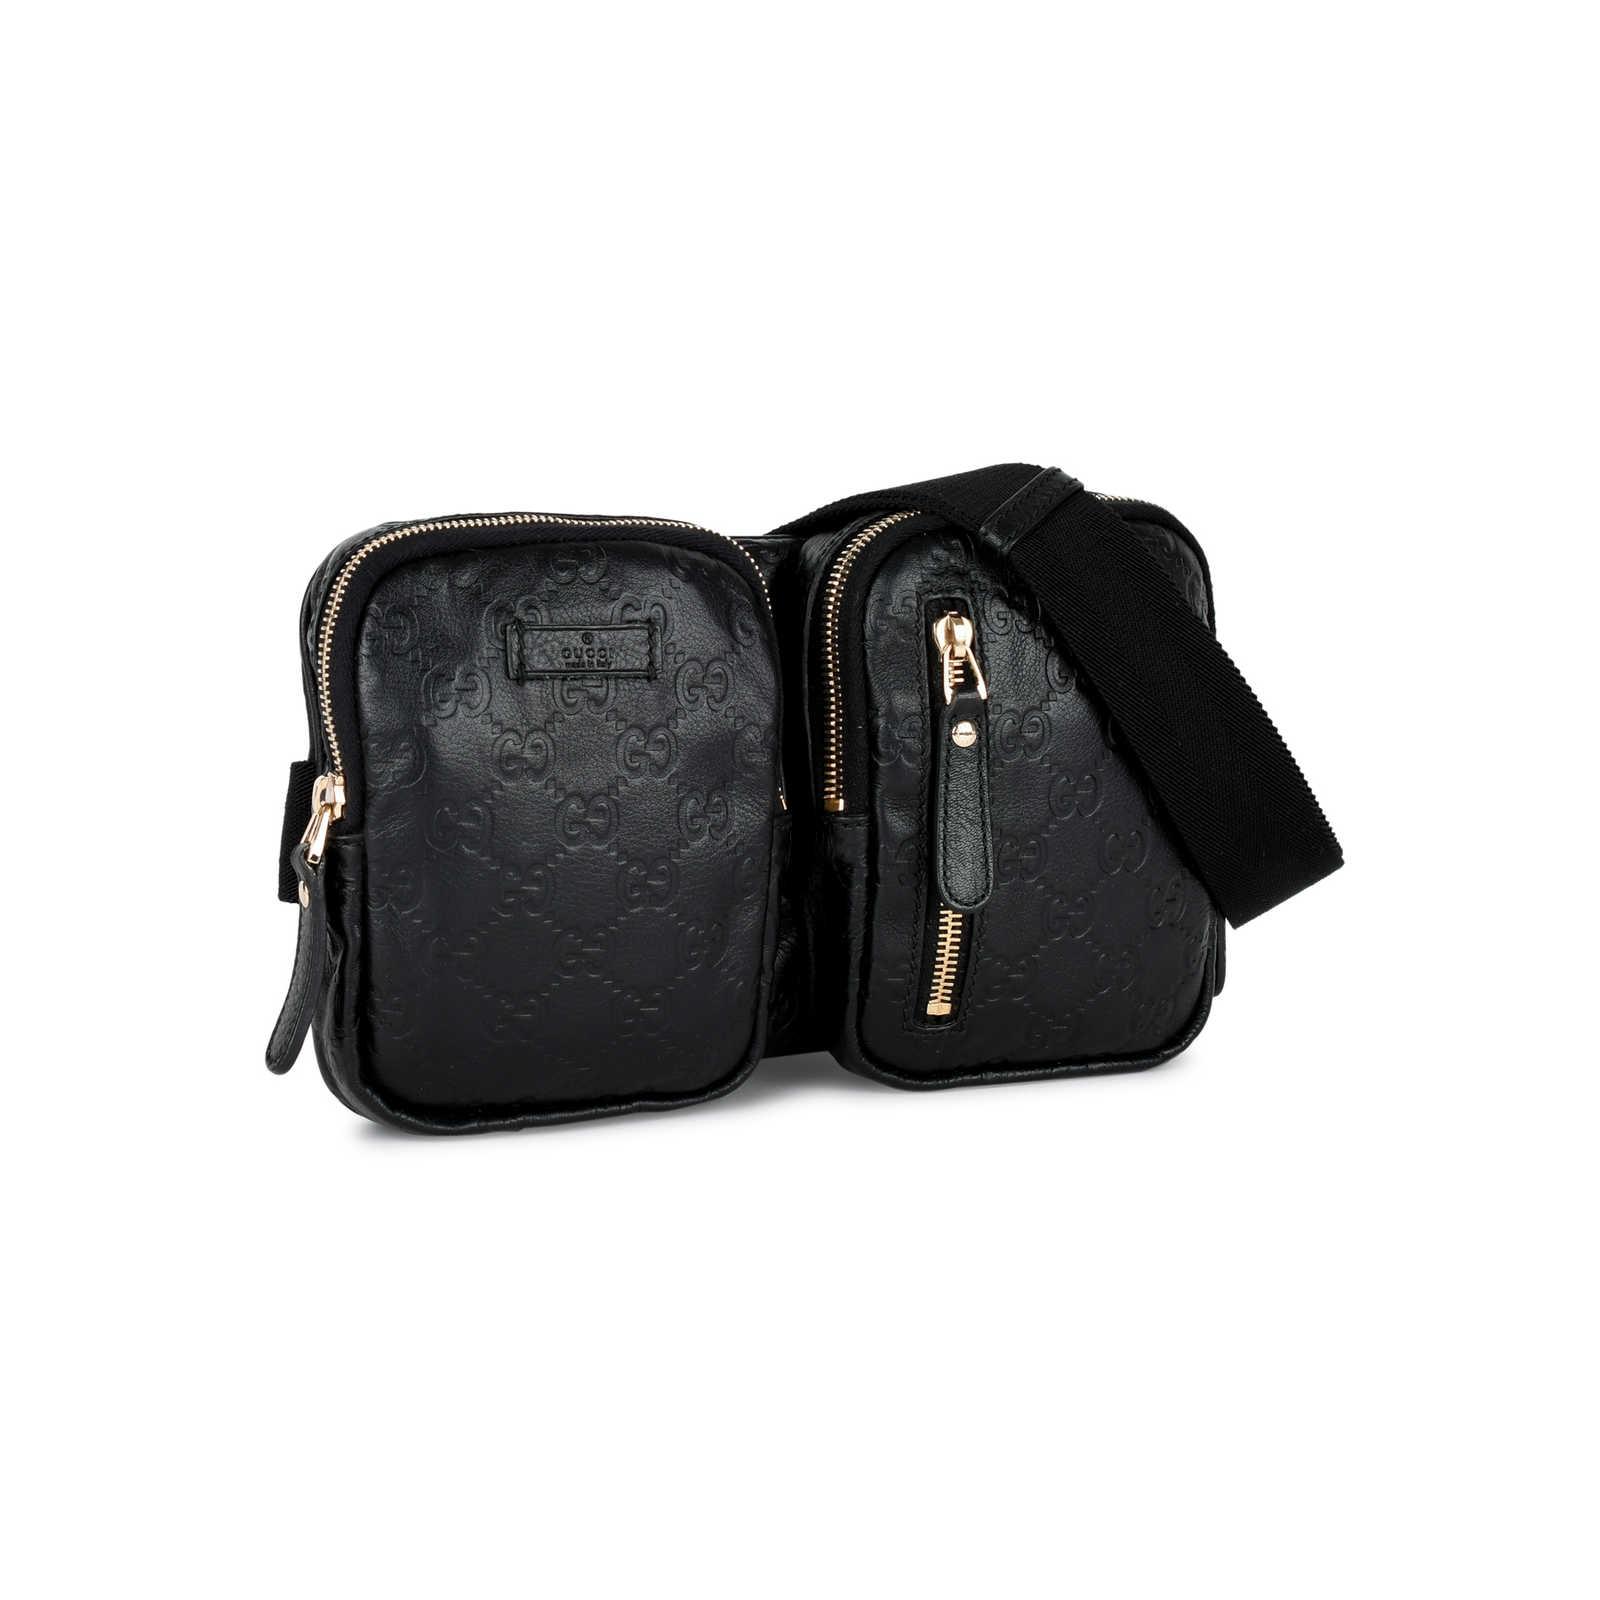 fdec6bba3a5e ... Authentic Second Hand Gucci Guccissima Belt Bag (PSS-430-00023) -  Thumbnail ...